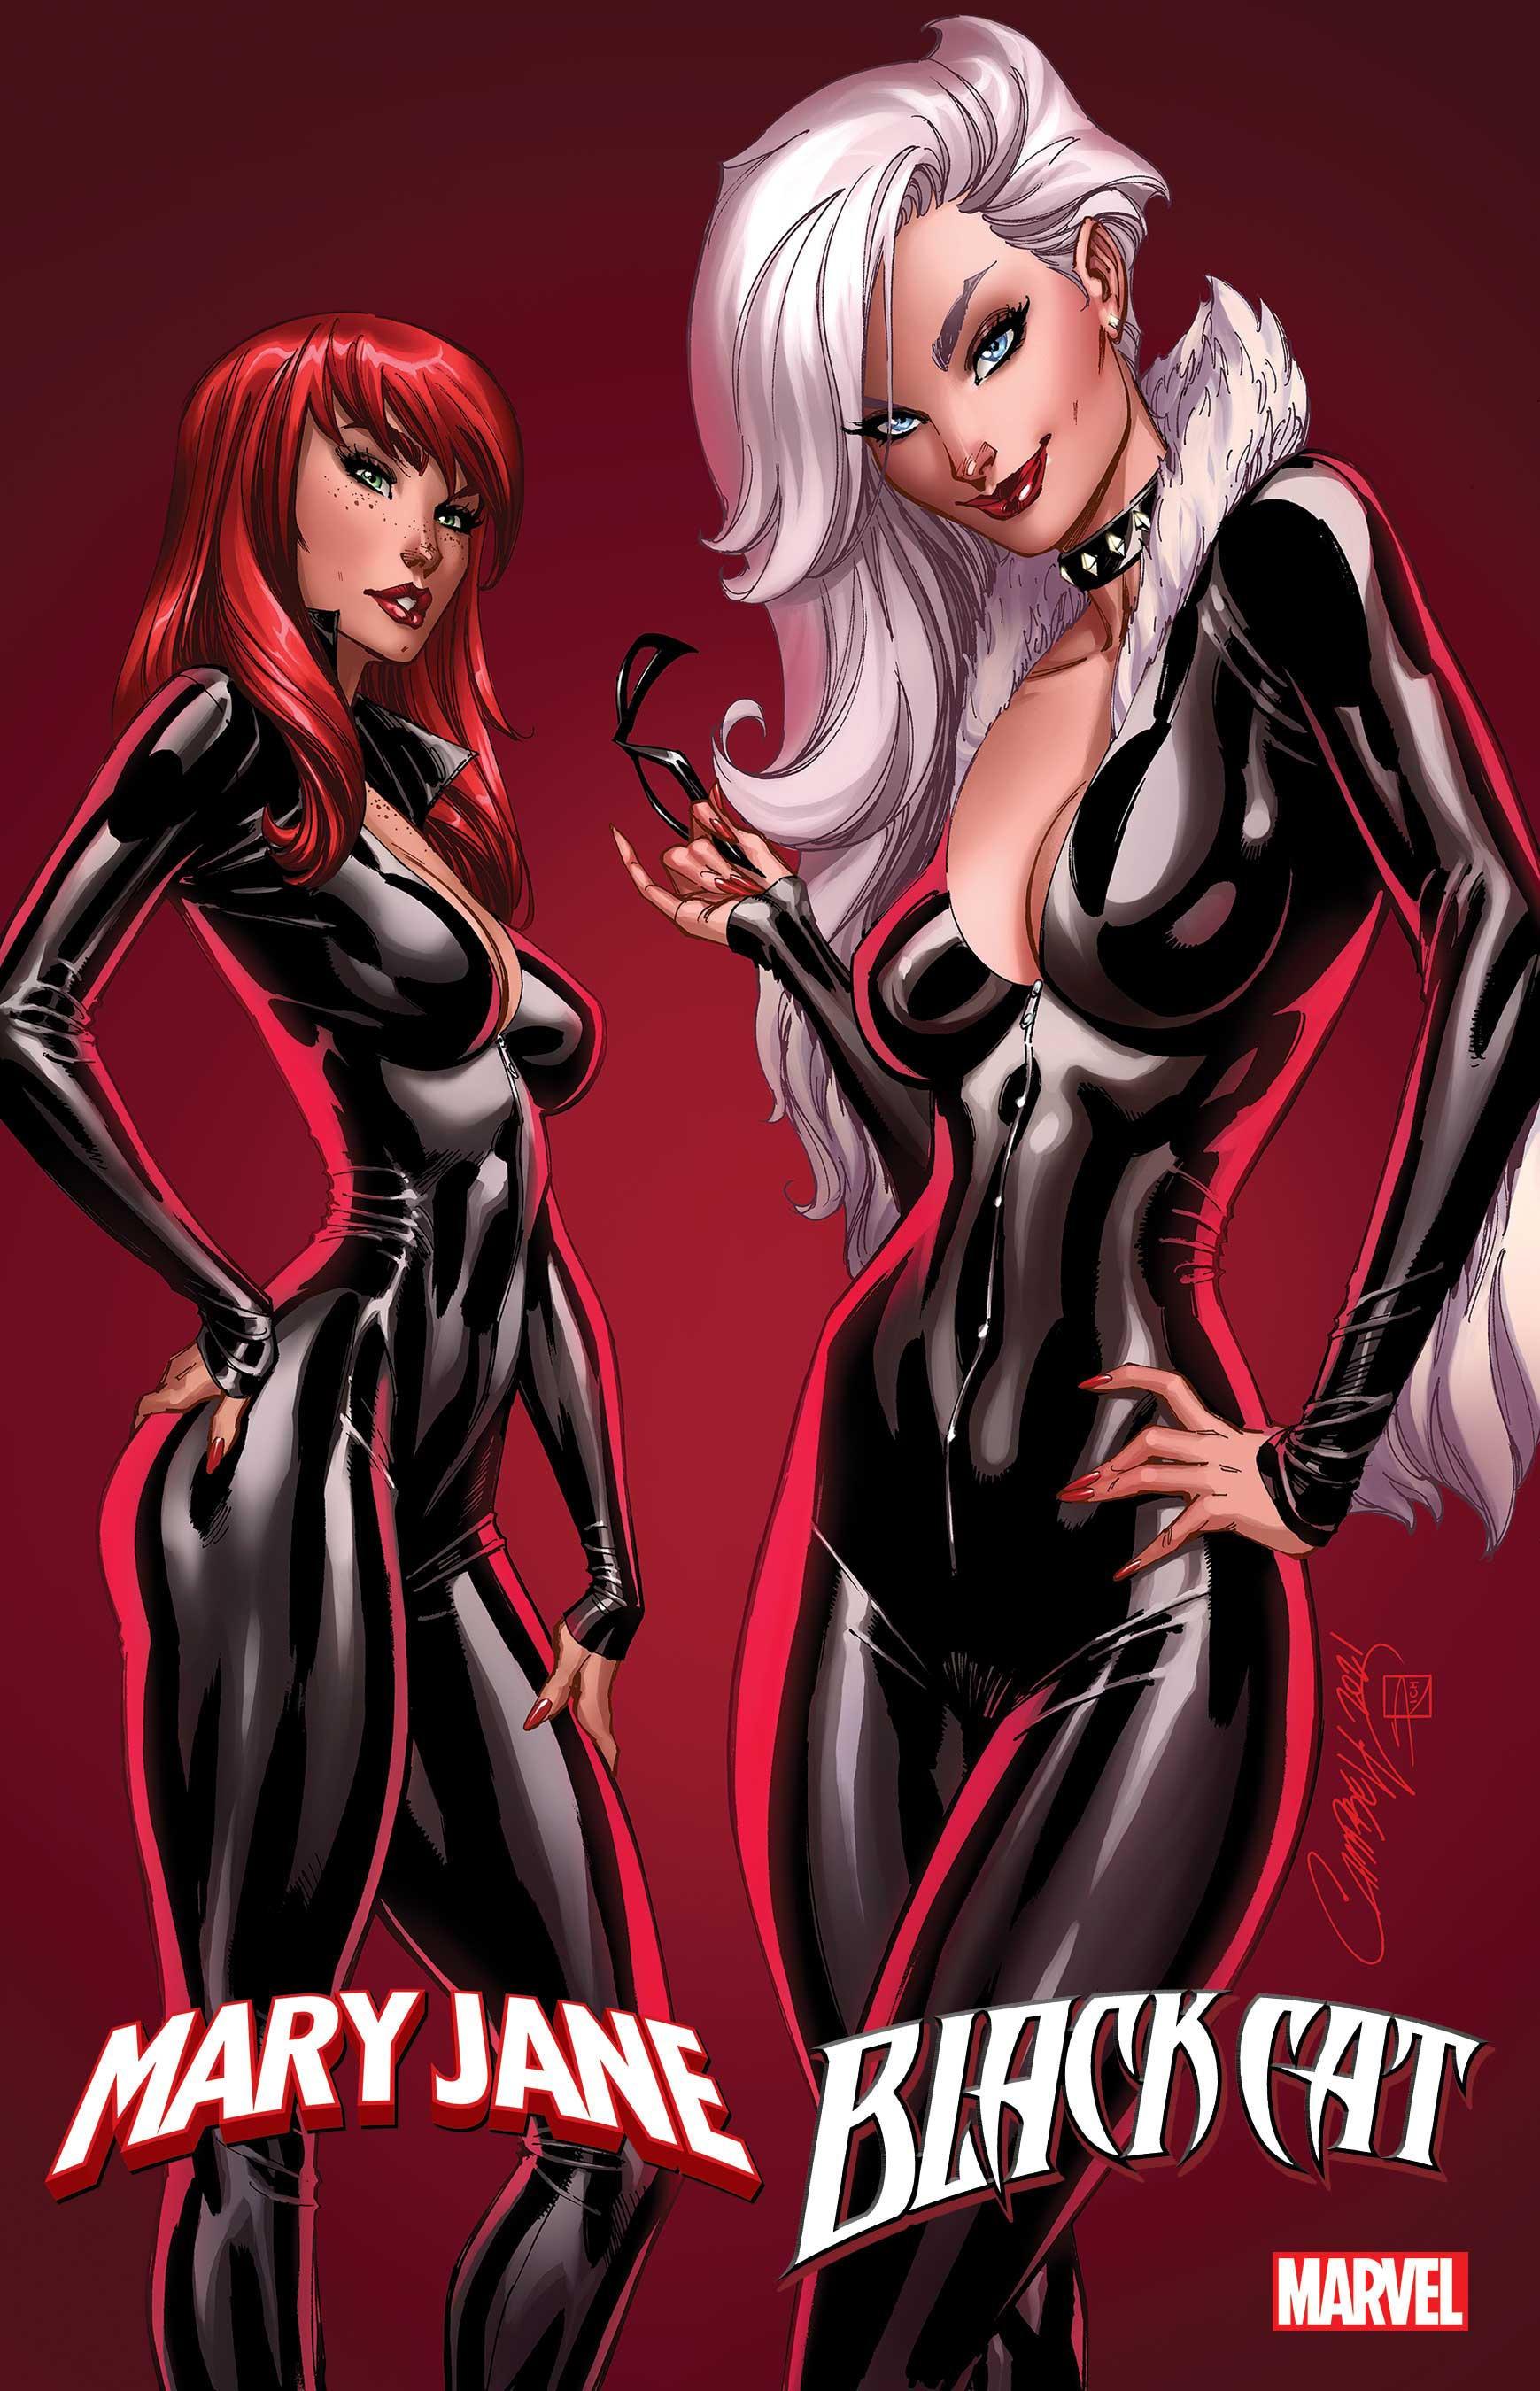 Mary Jane & Black Cat: Beyond